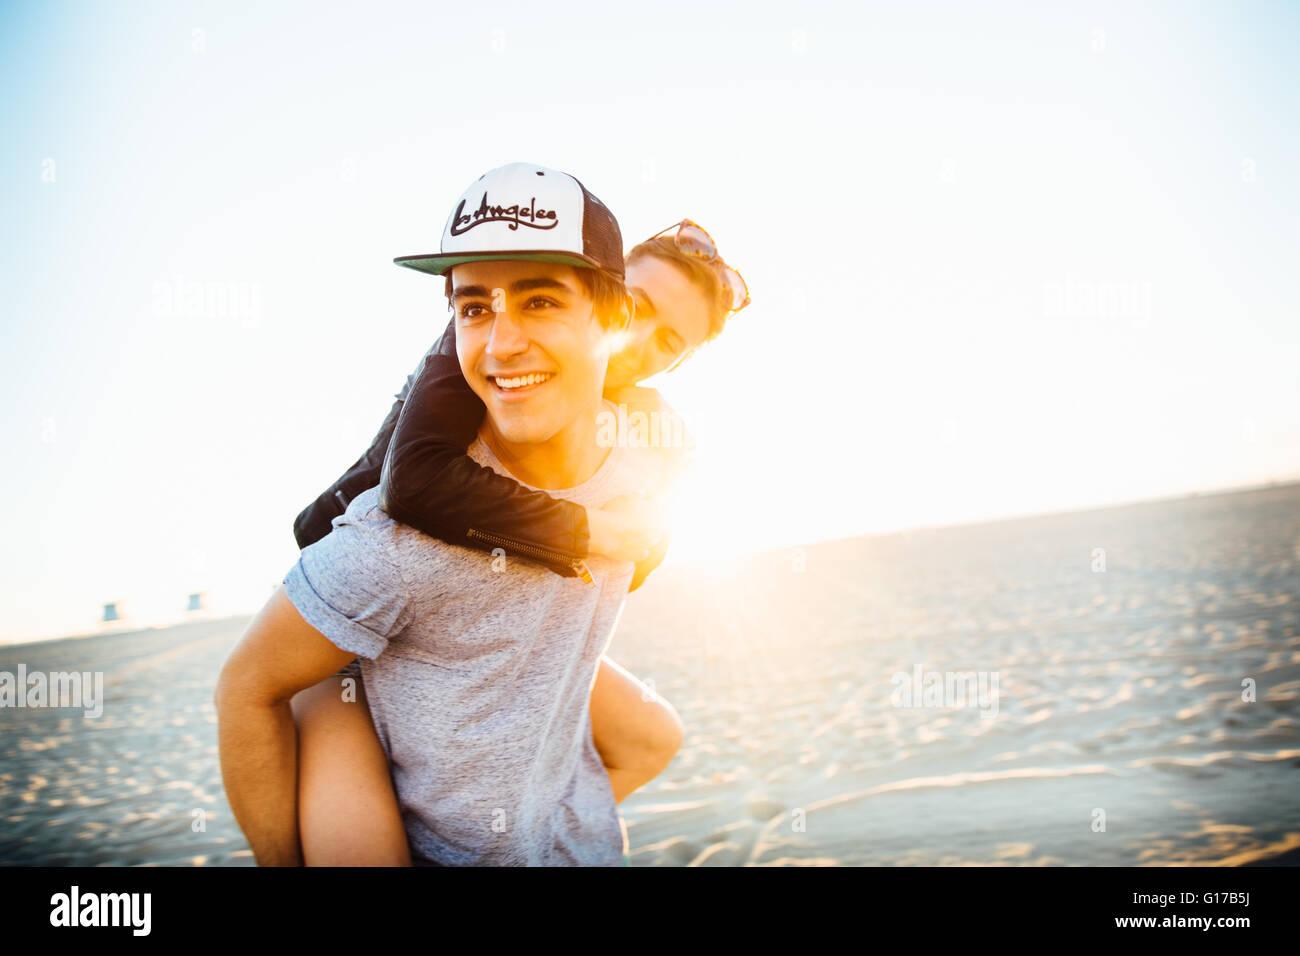 Young man giving girlfriend a piggy back sur la plage ensoleillée, Venice Beach, California, USA Photo Stock